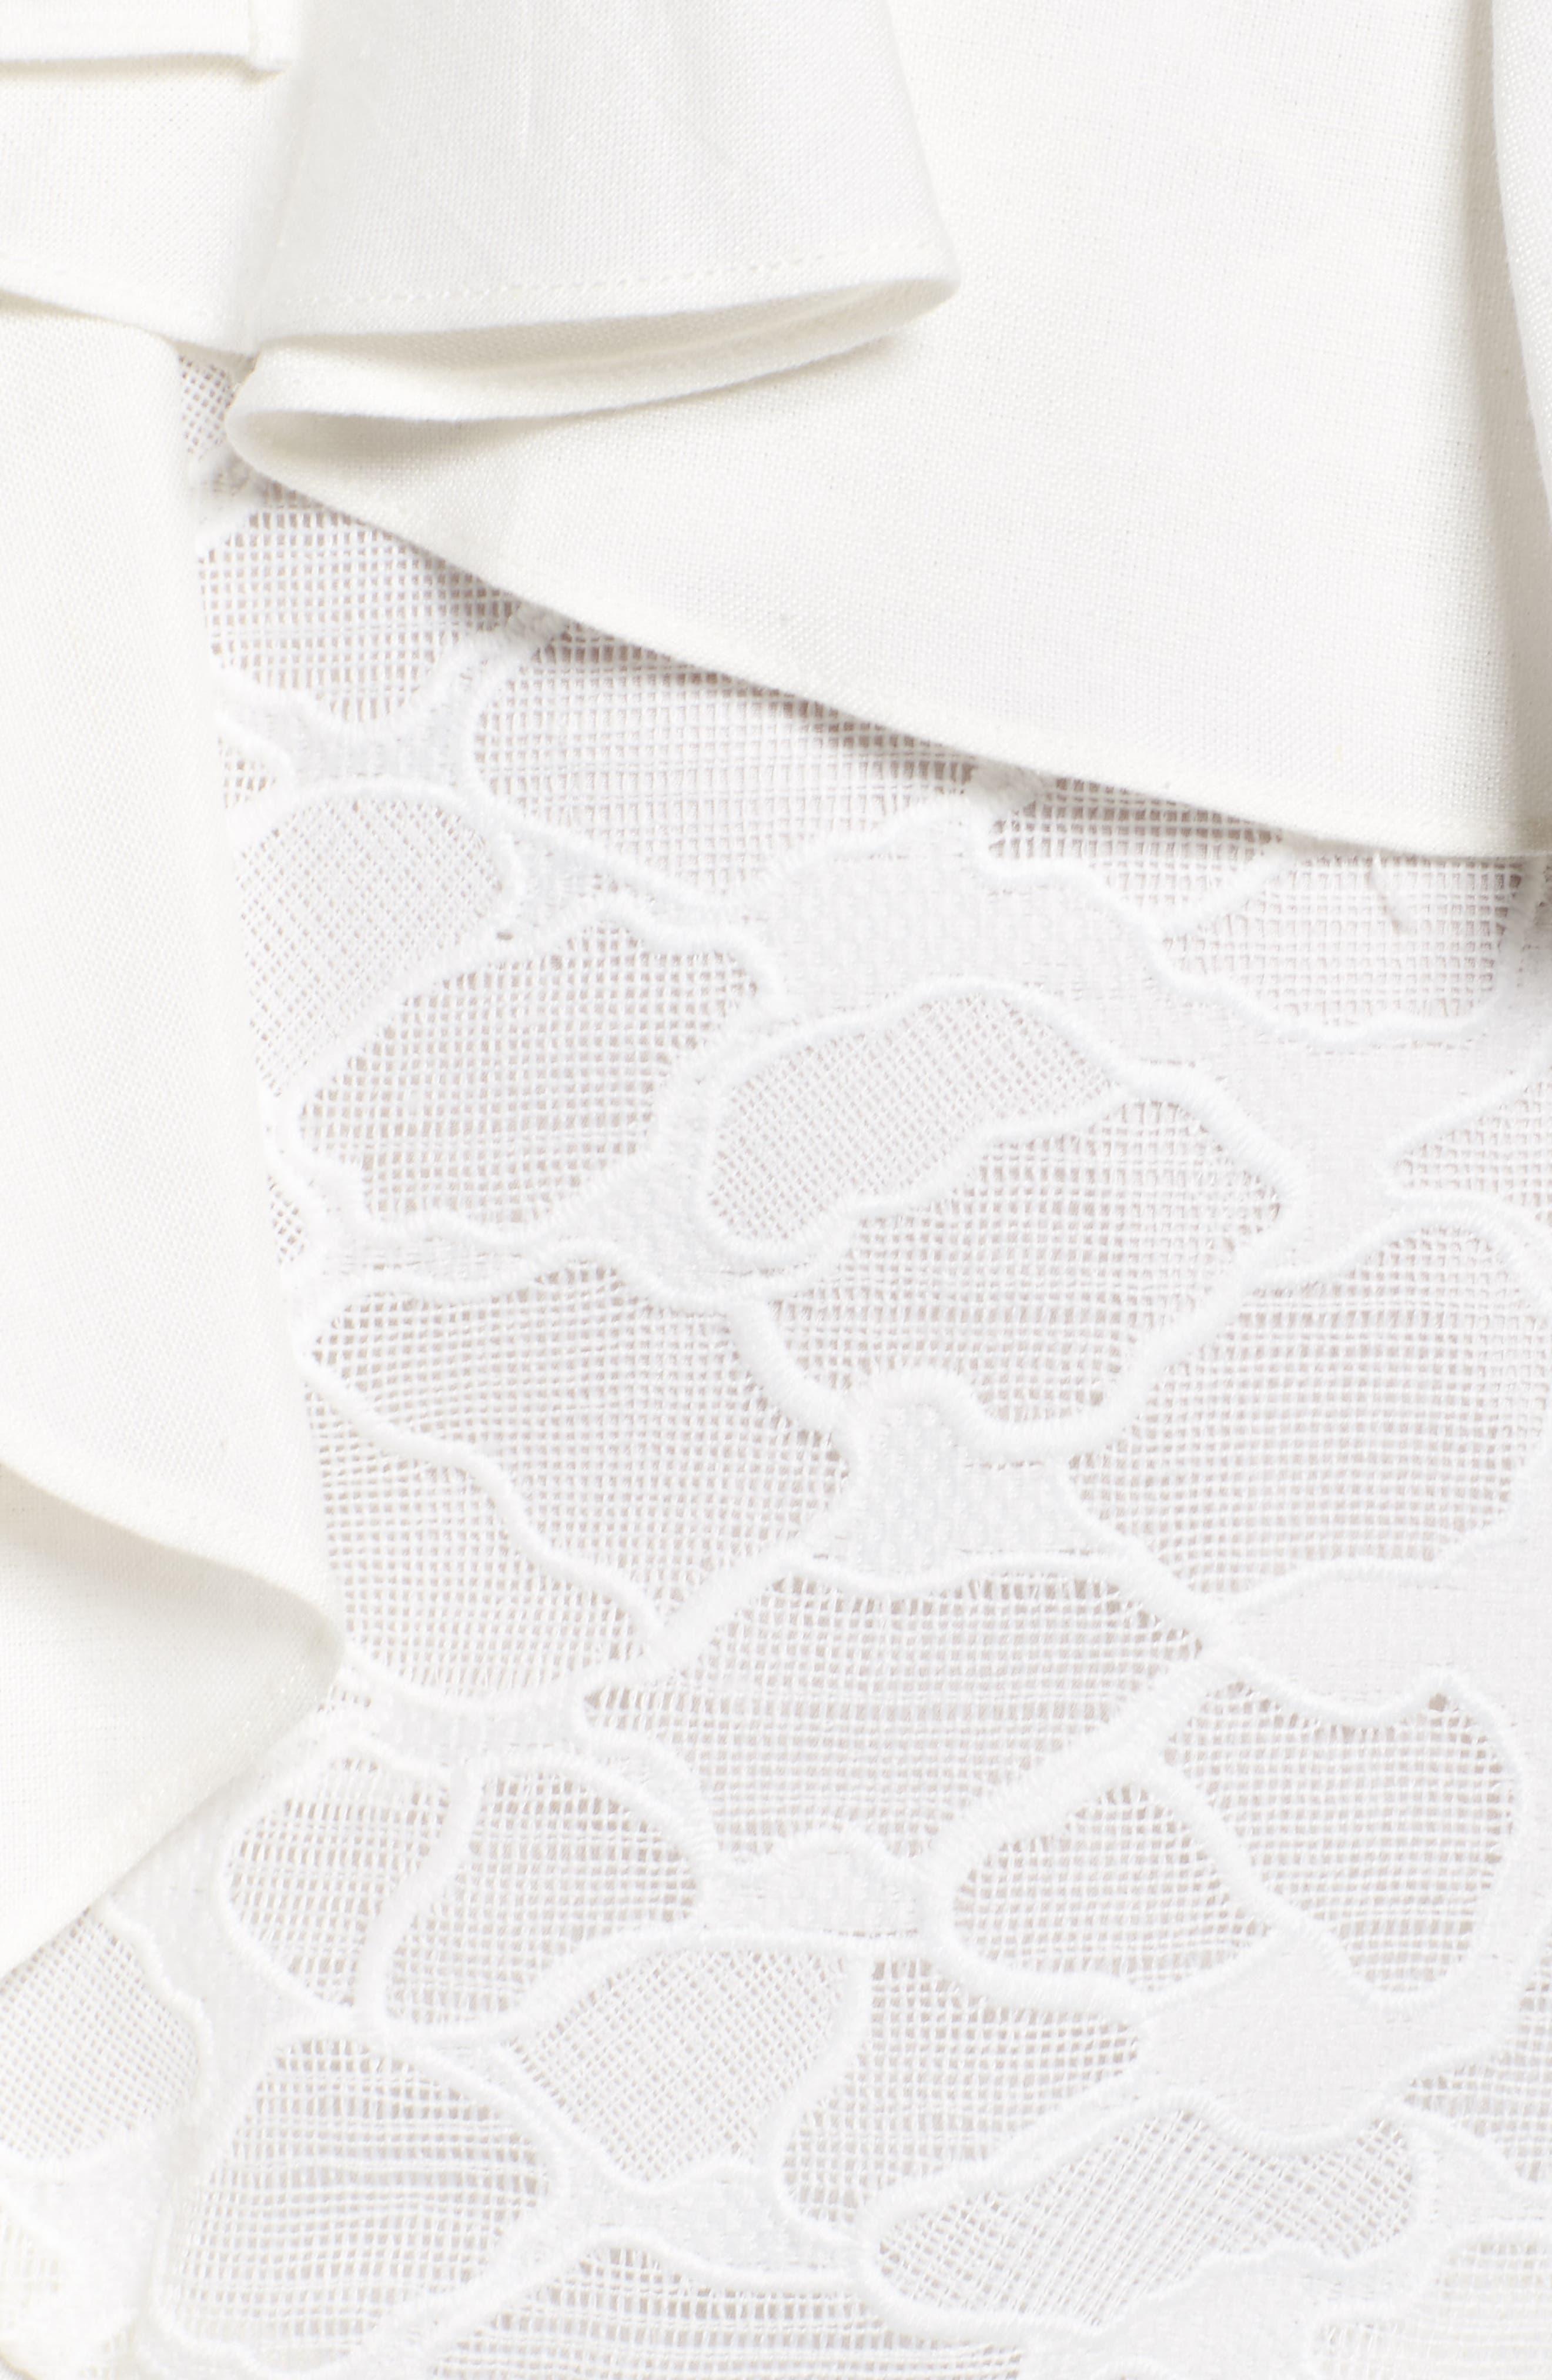 Phase Ruffle Lace Minidress,                             Alternate thumbnail 5, color,                             902